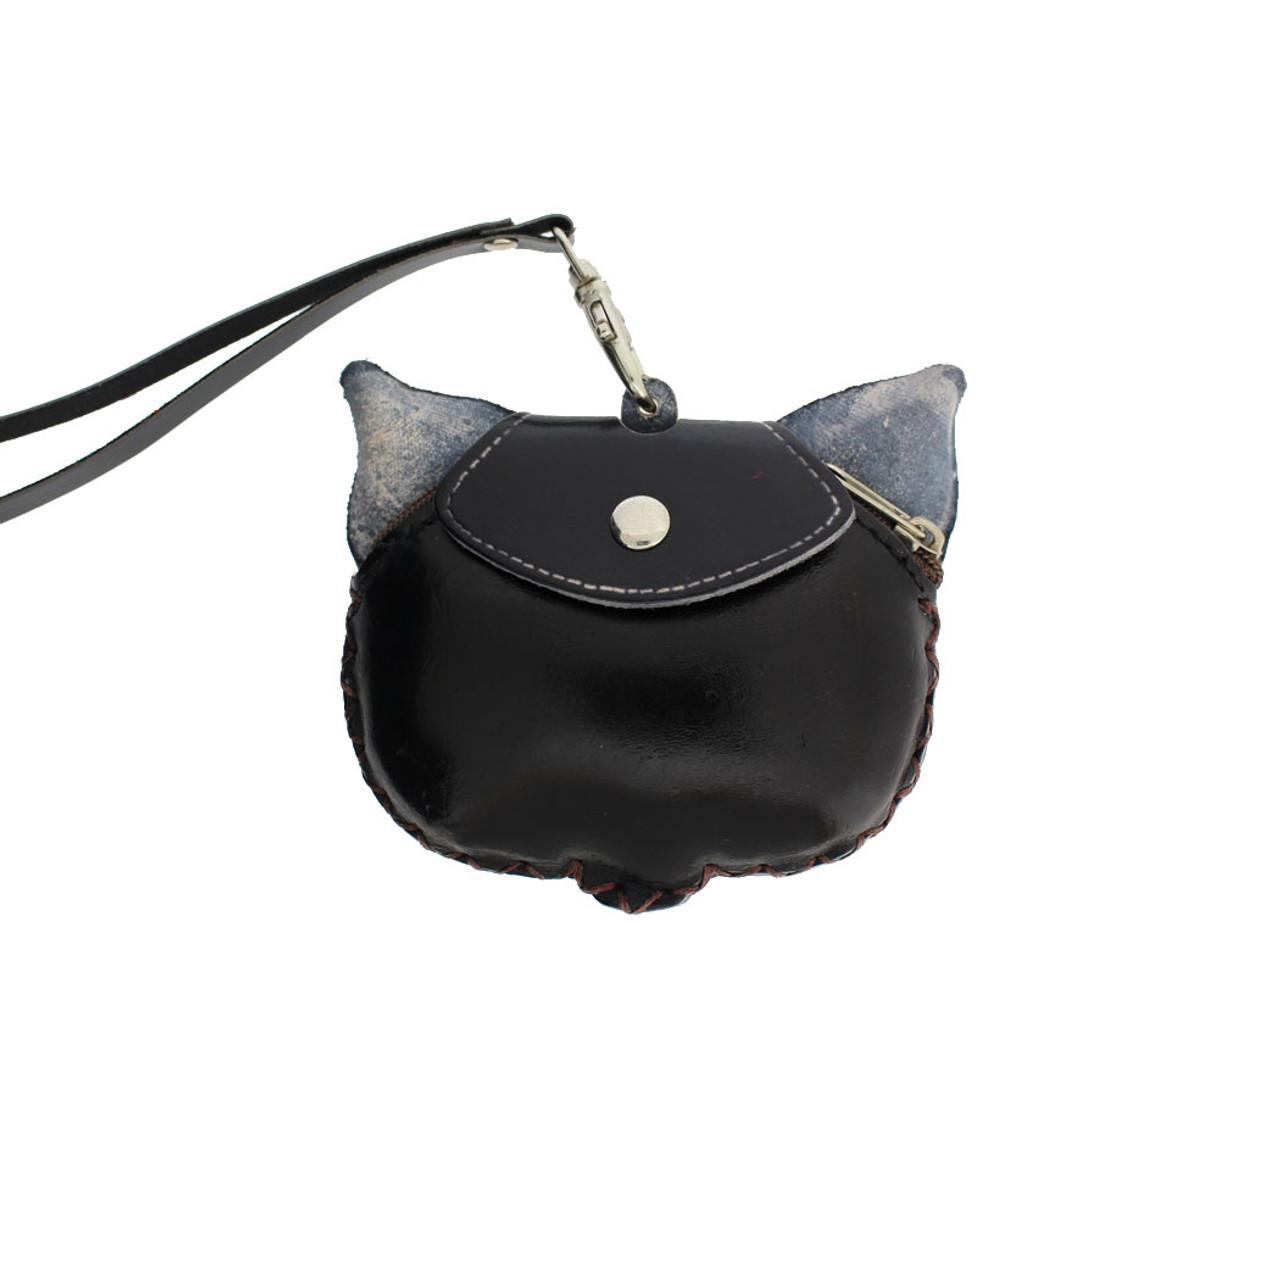 90181032d93 Black Leather Cat Wristlet Coin Purse with Strap - Purple Leopard ...